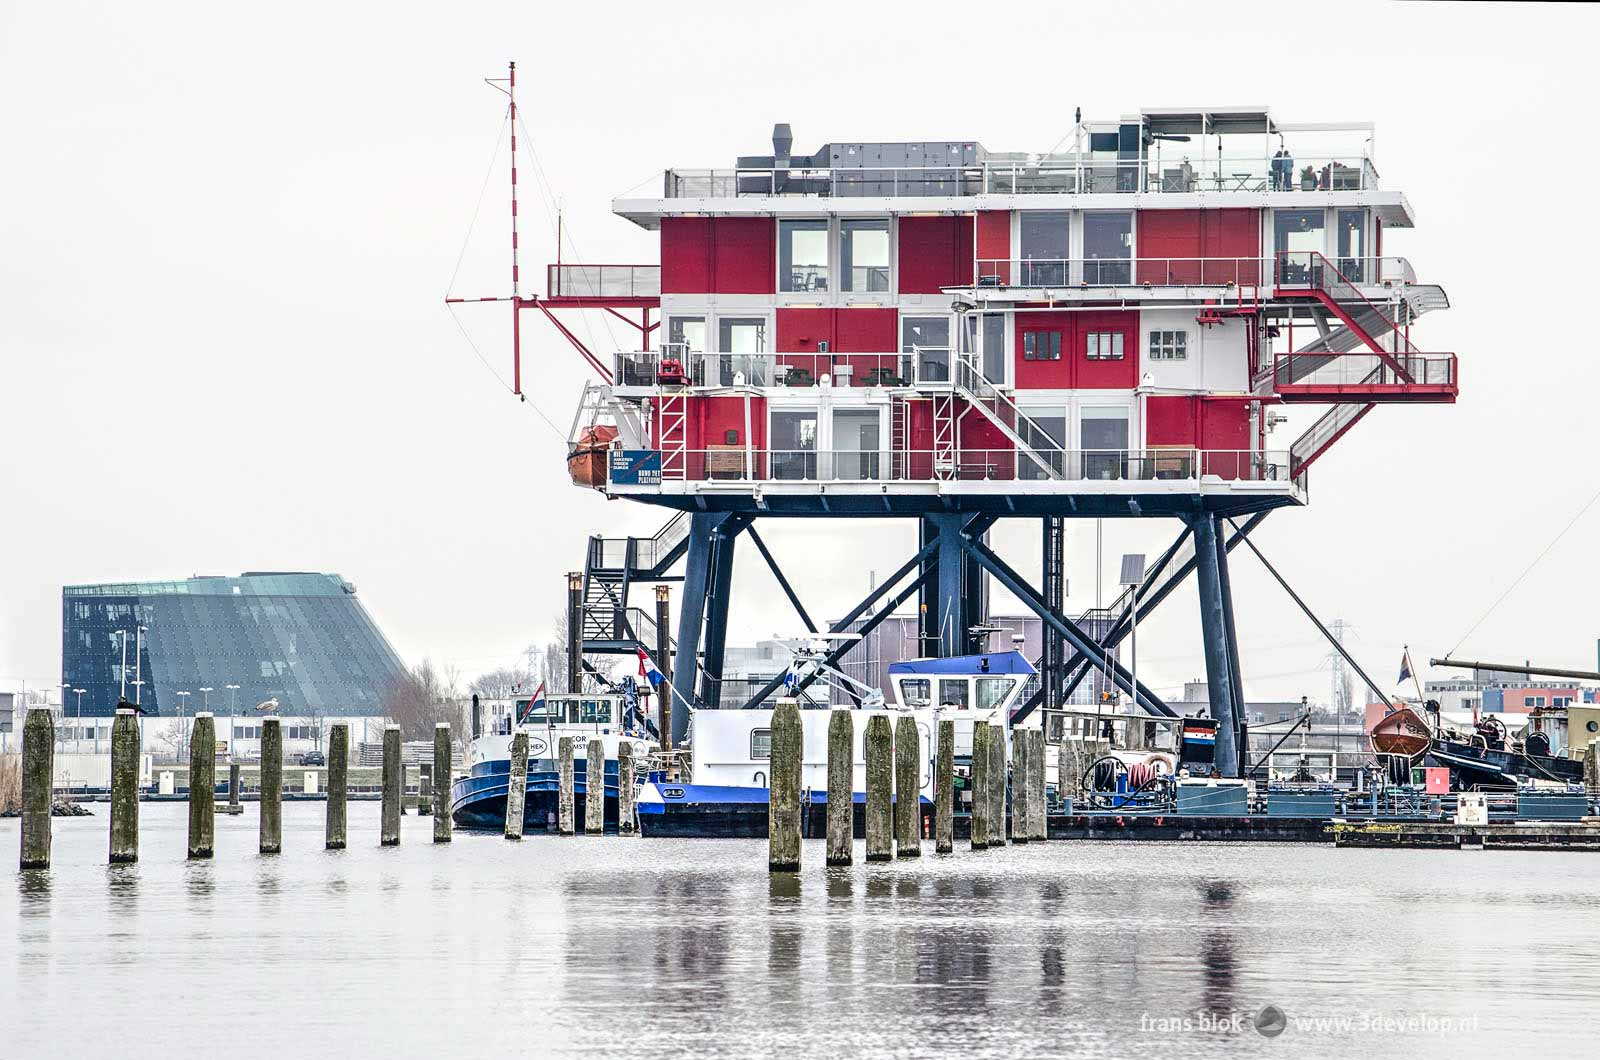 Voormalig booreiland en piratennest het REM-eiland in de Houthaven in Amsterdam